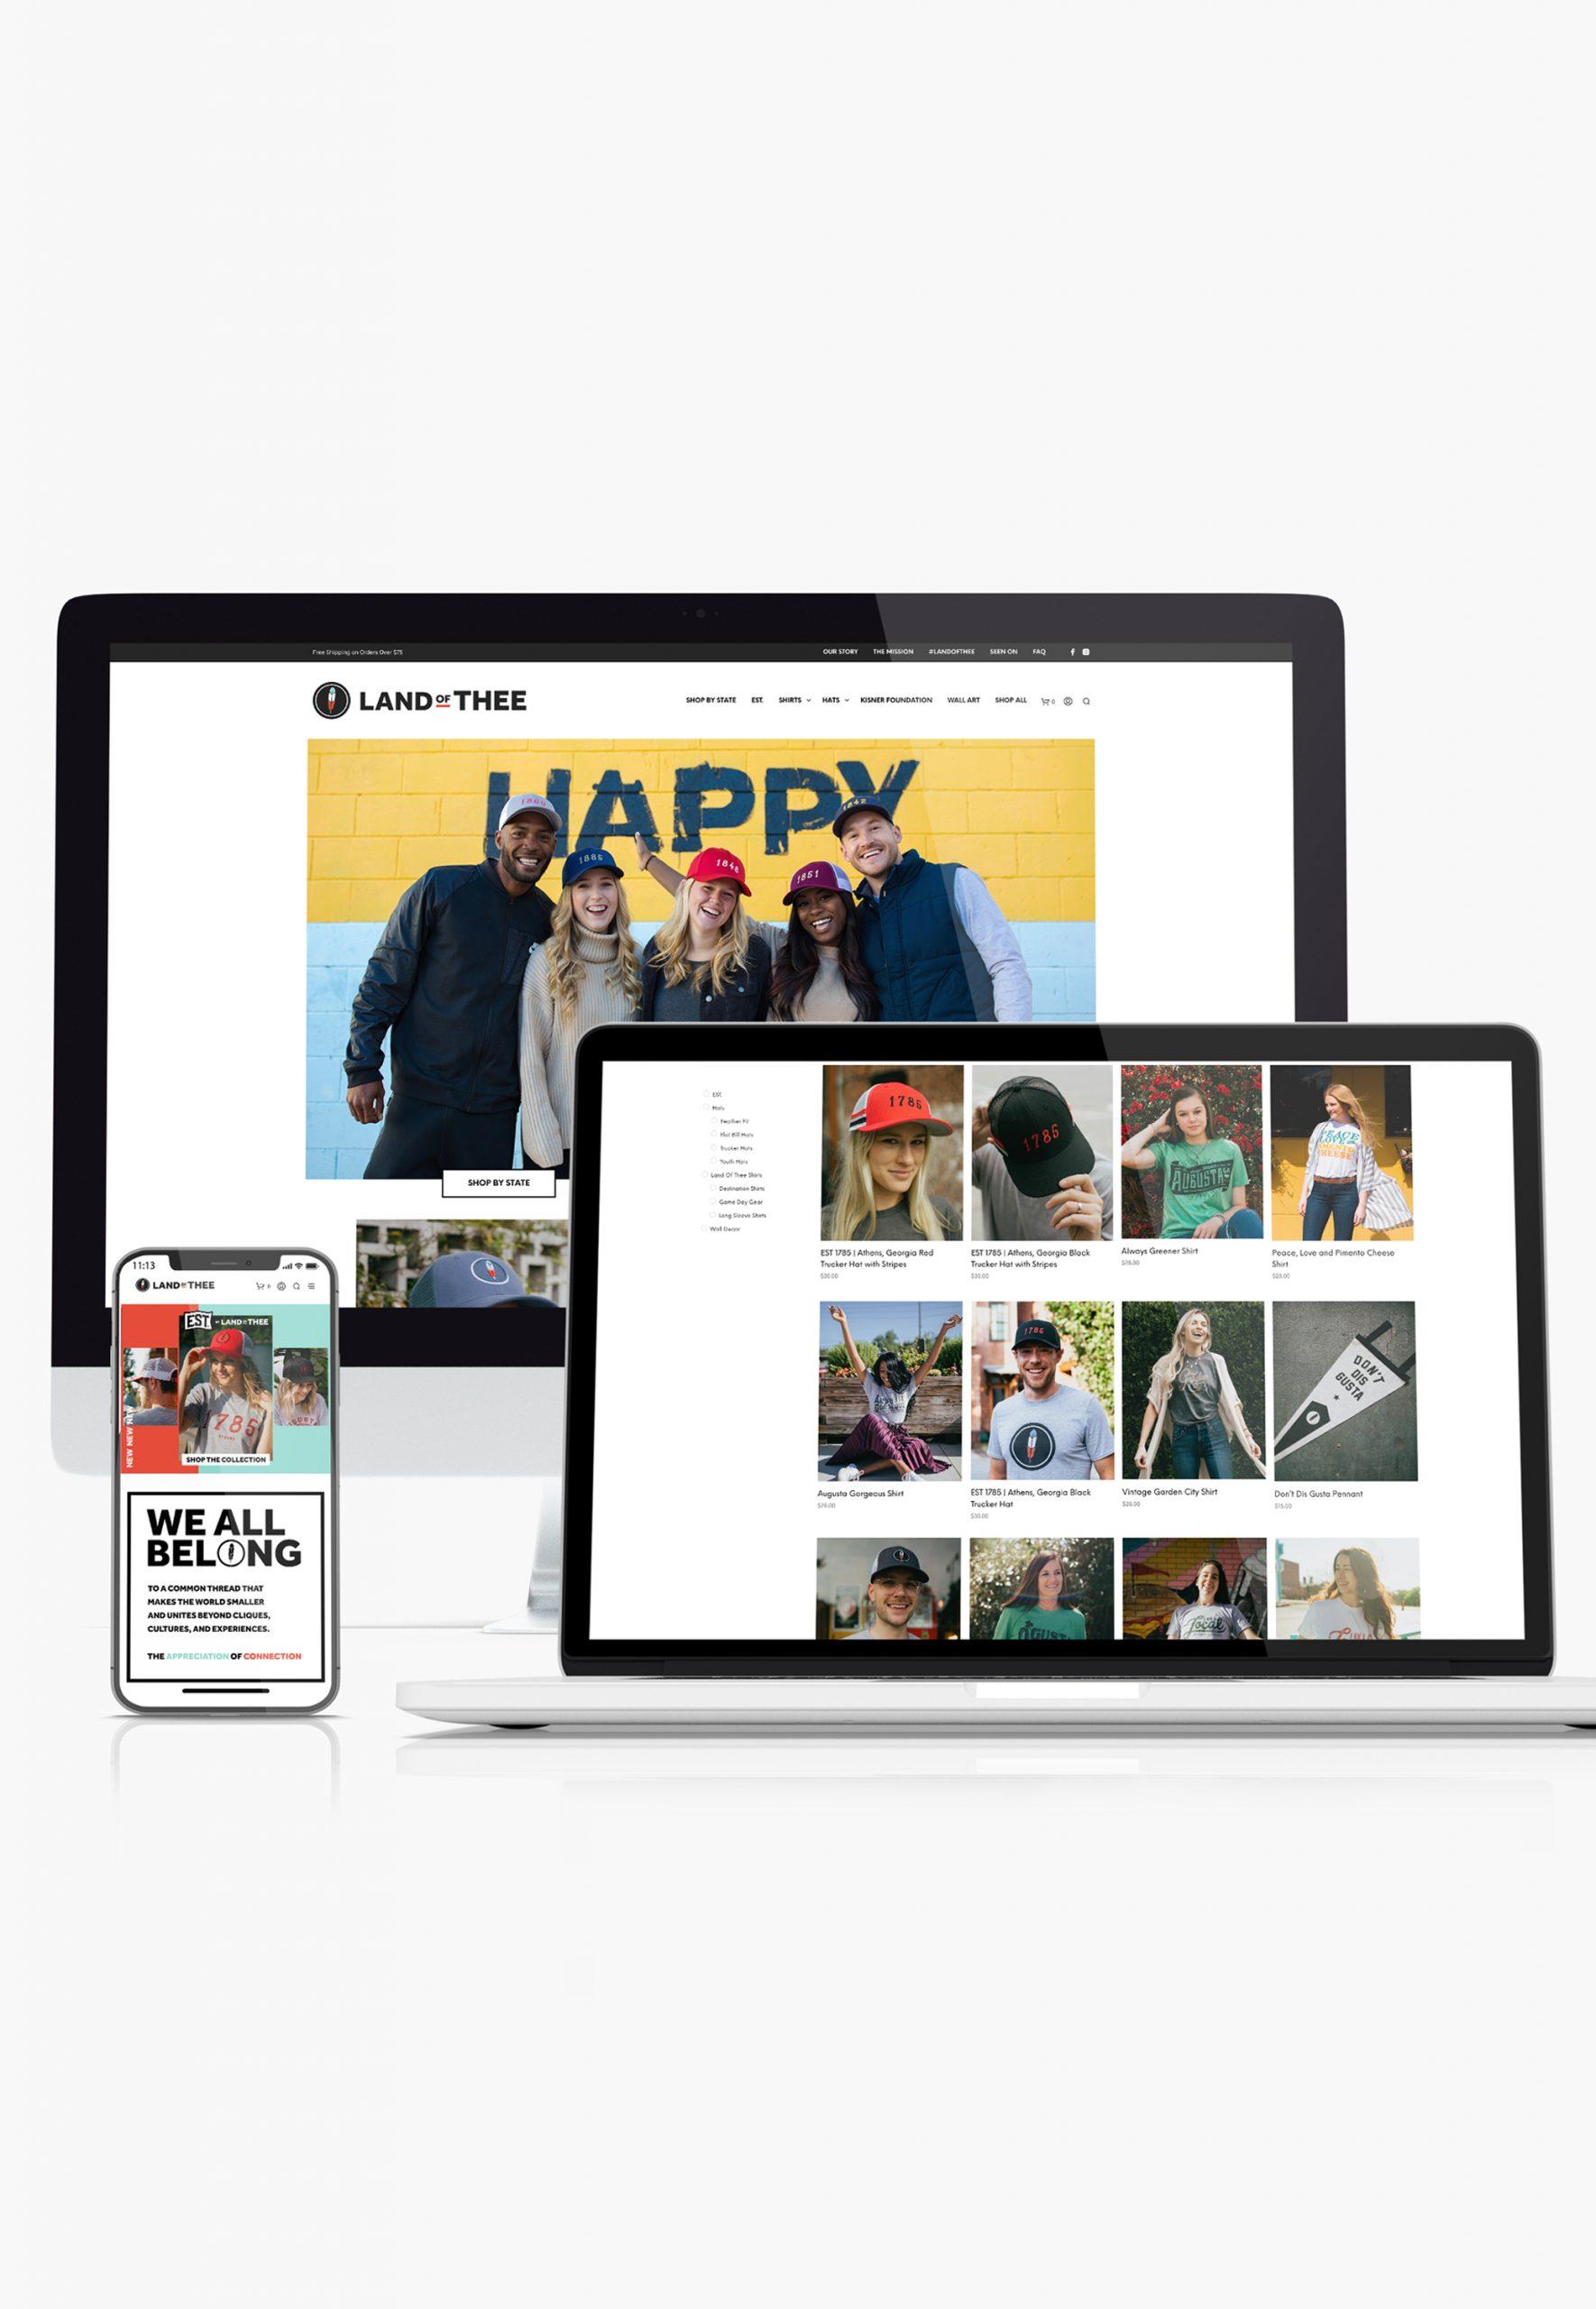 Land of Thee website design shown across multiple websites